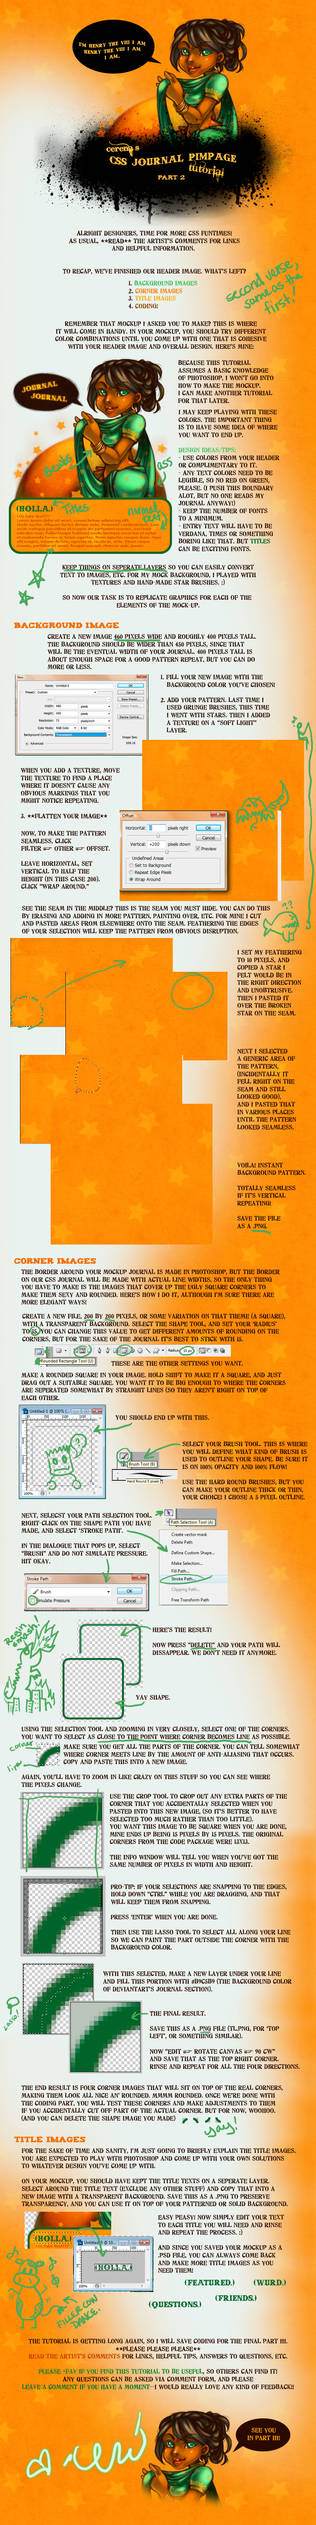 CSS Journal Tutorial - Part II